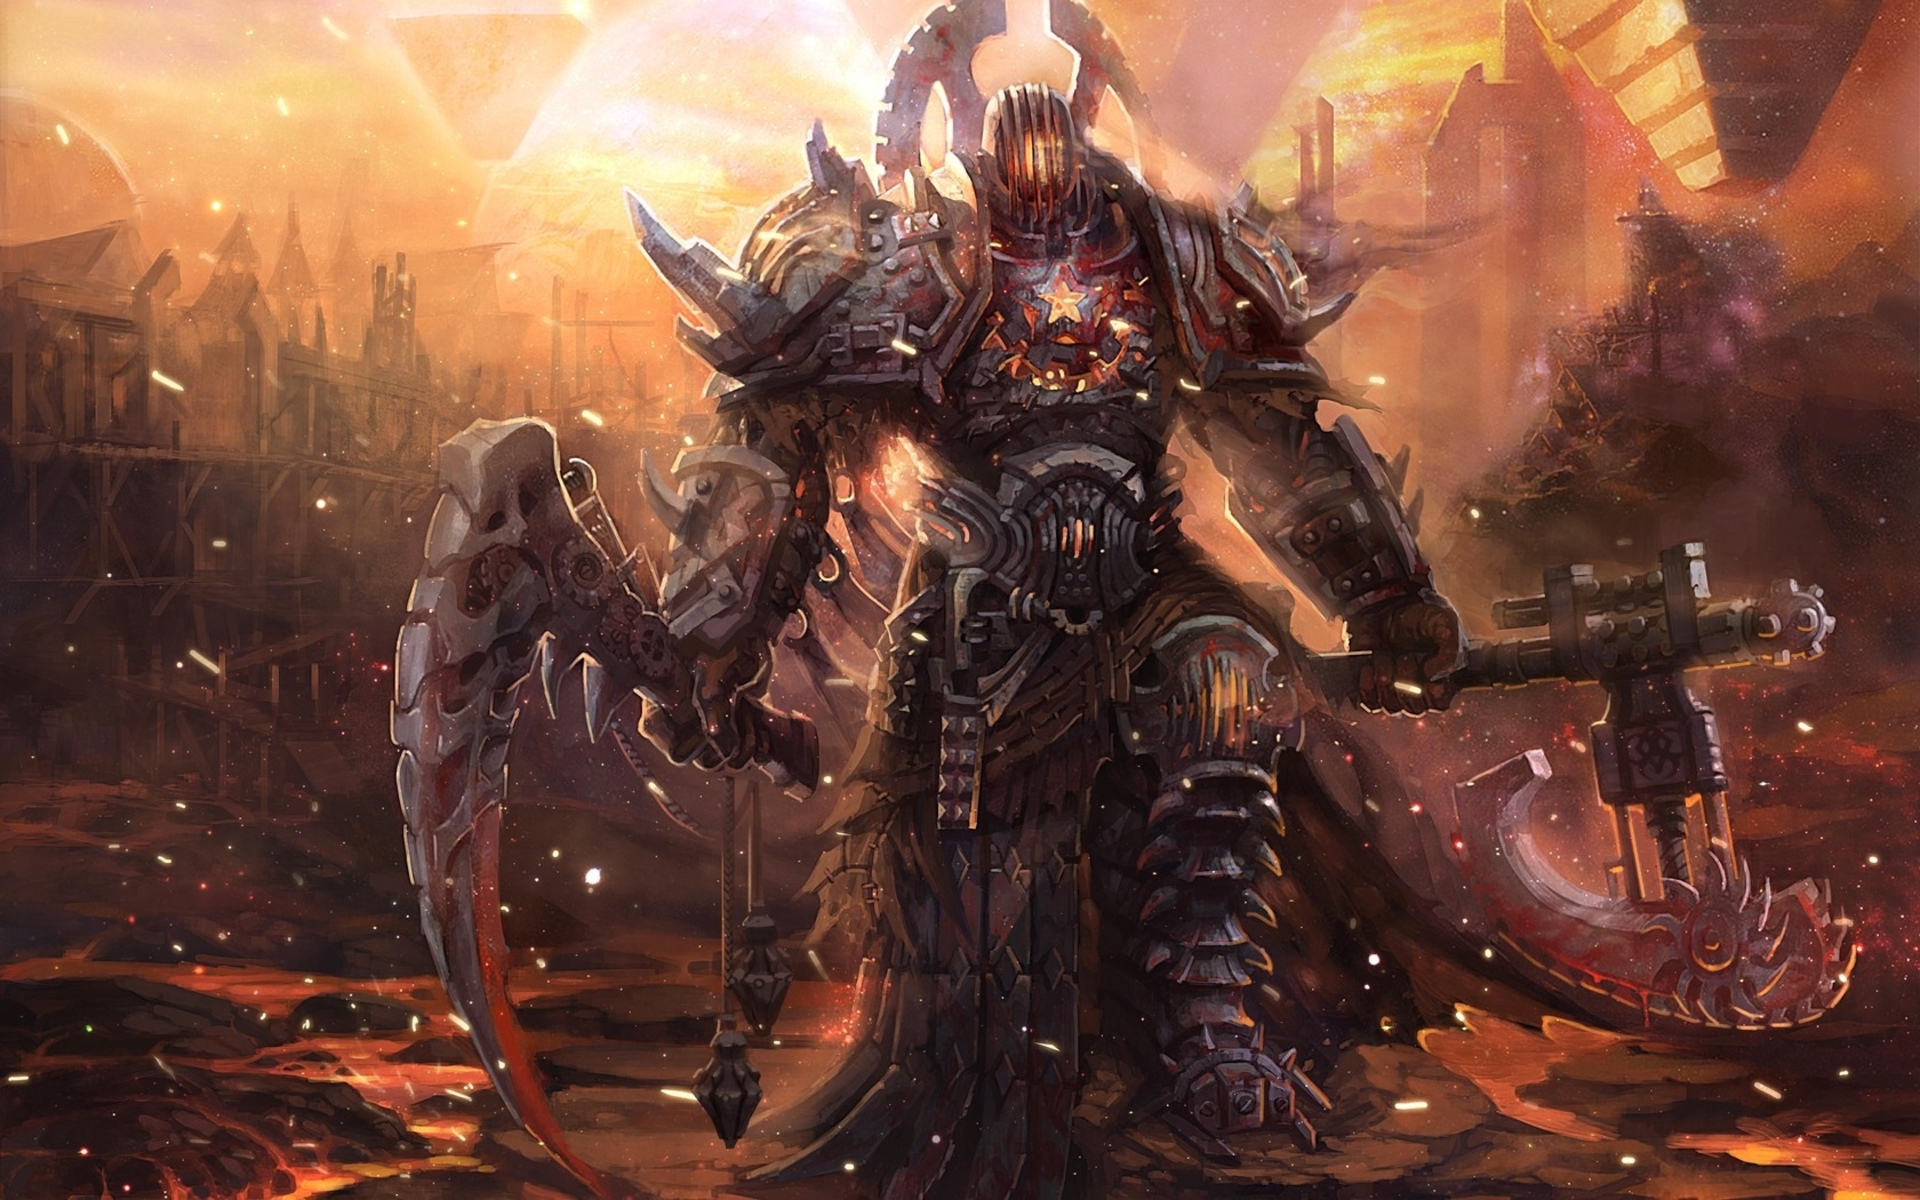 fantasy warrior weapons fire cities demon art wallpaper